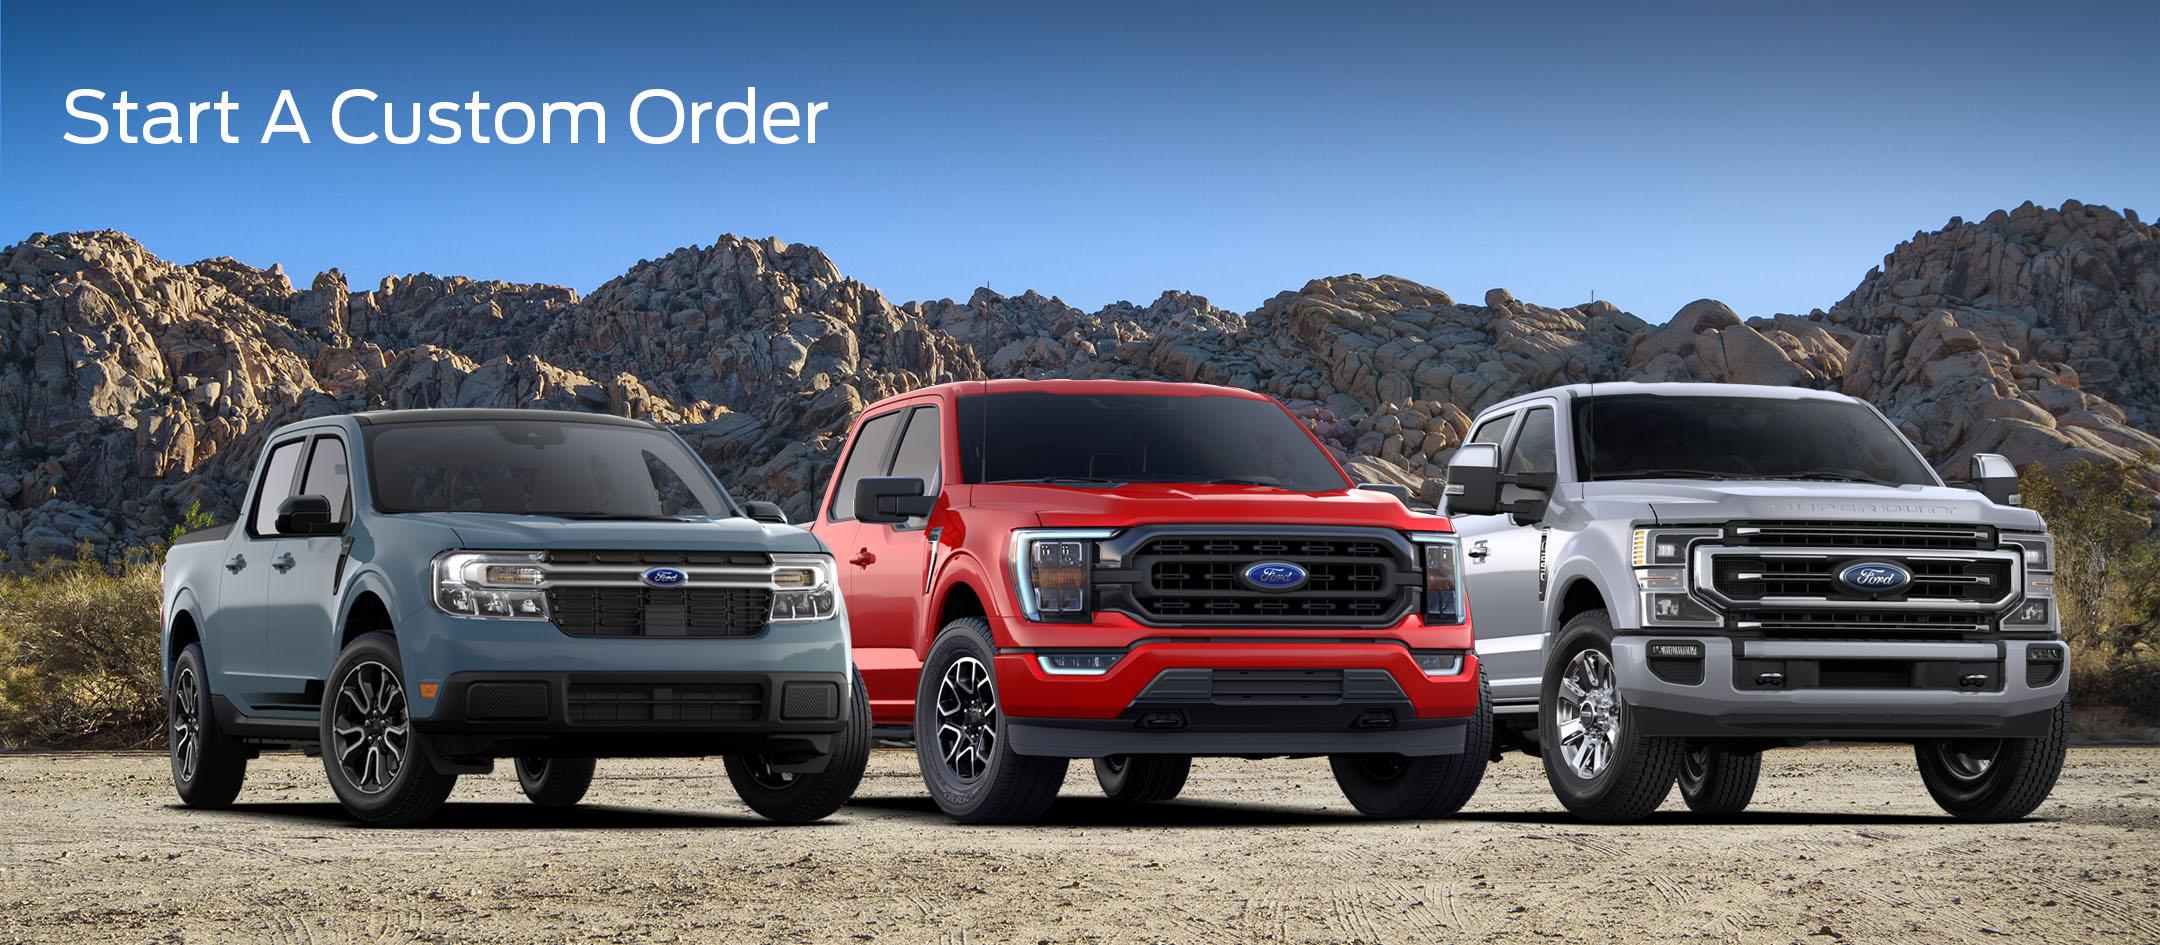 Hemborg Ford Customer Order Page Hero